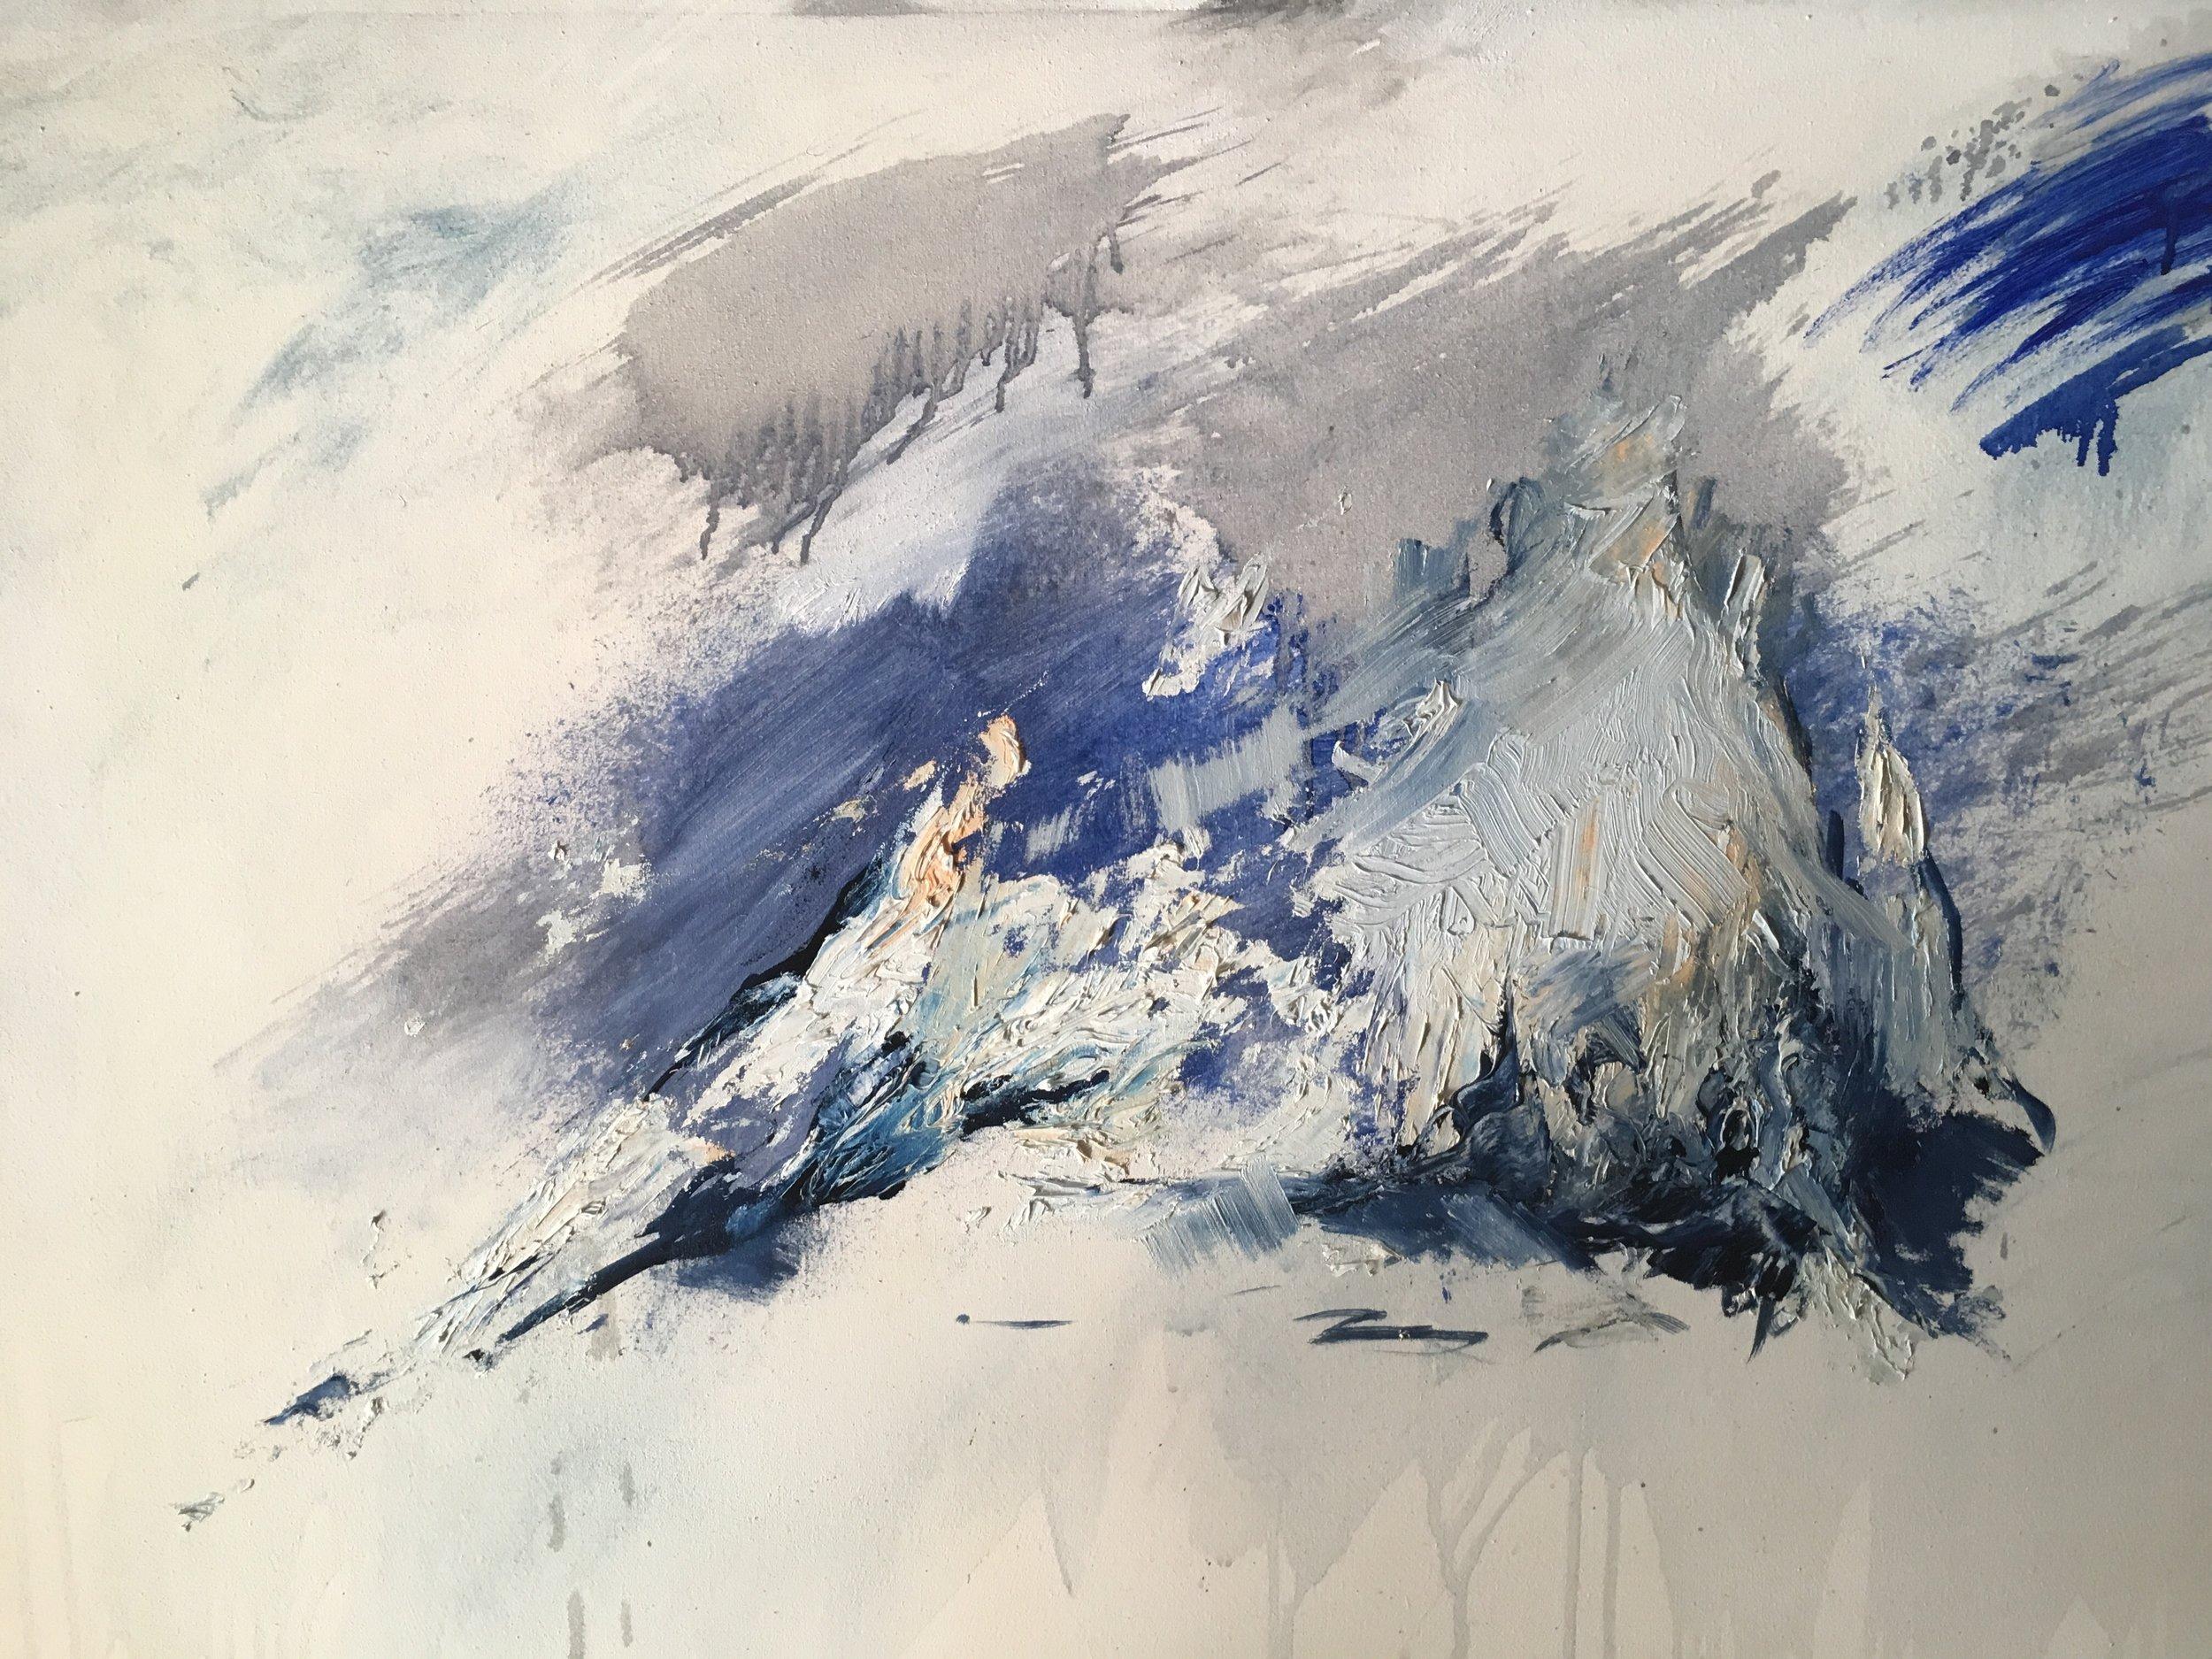 Glossario, 2018, oil on canvas, 100x120.